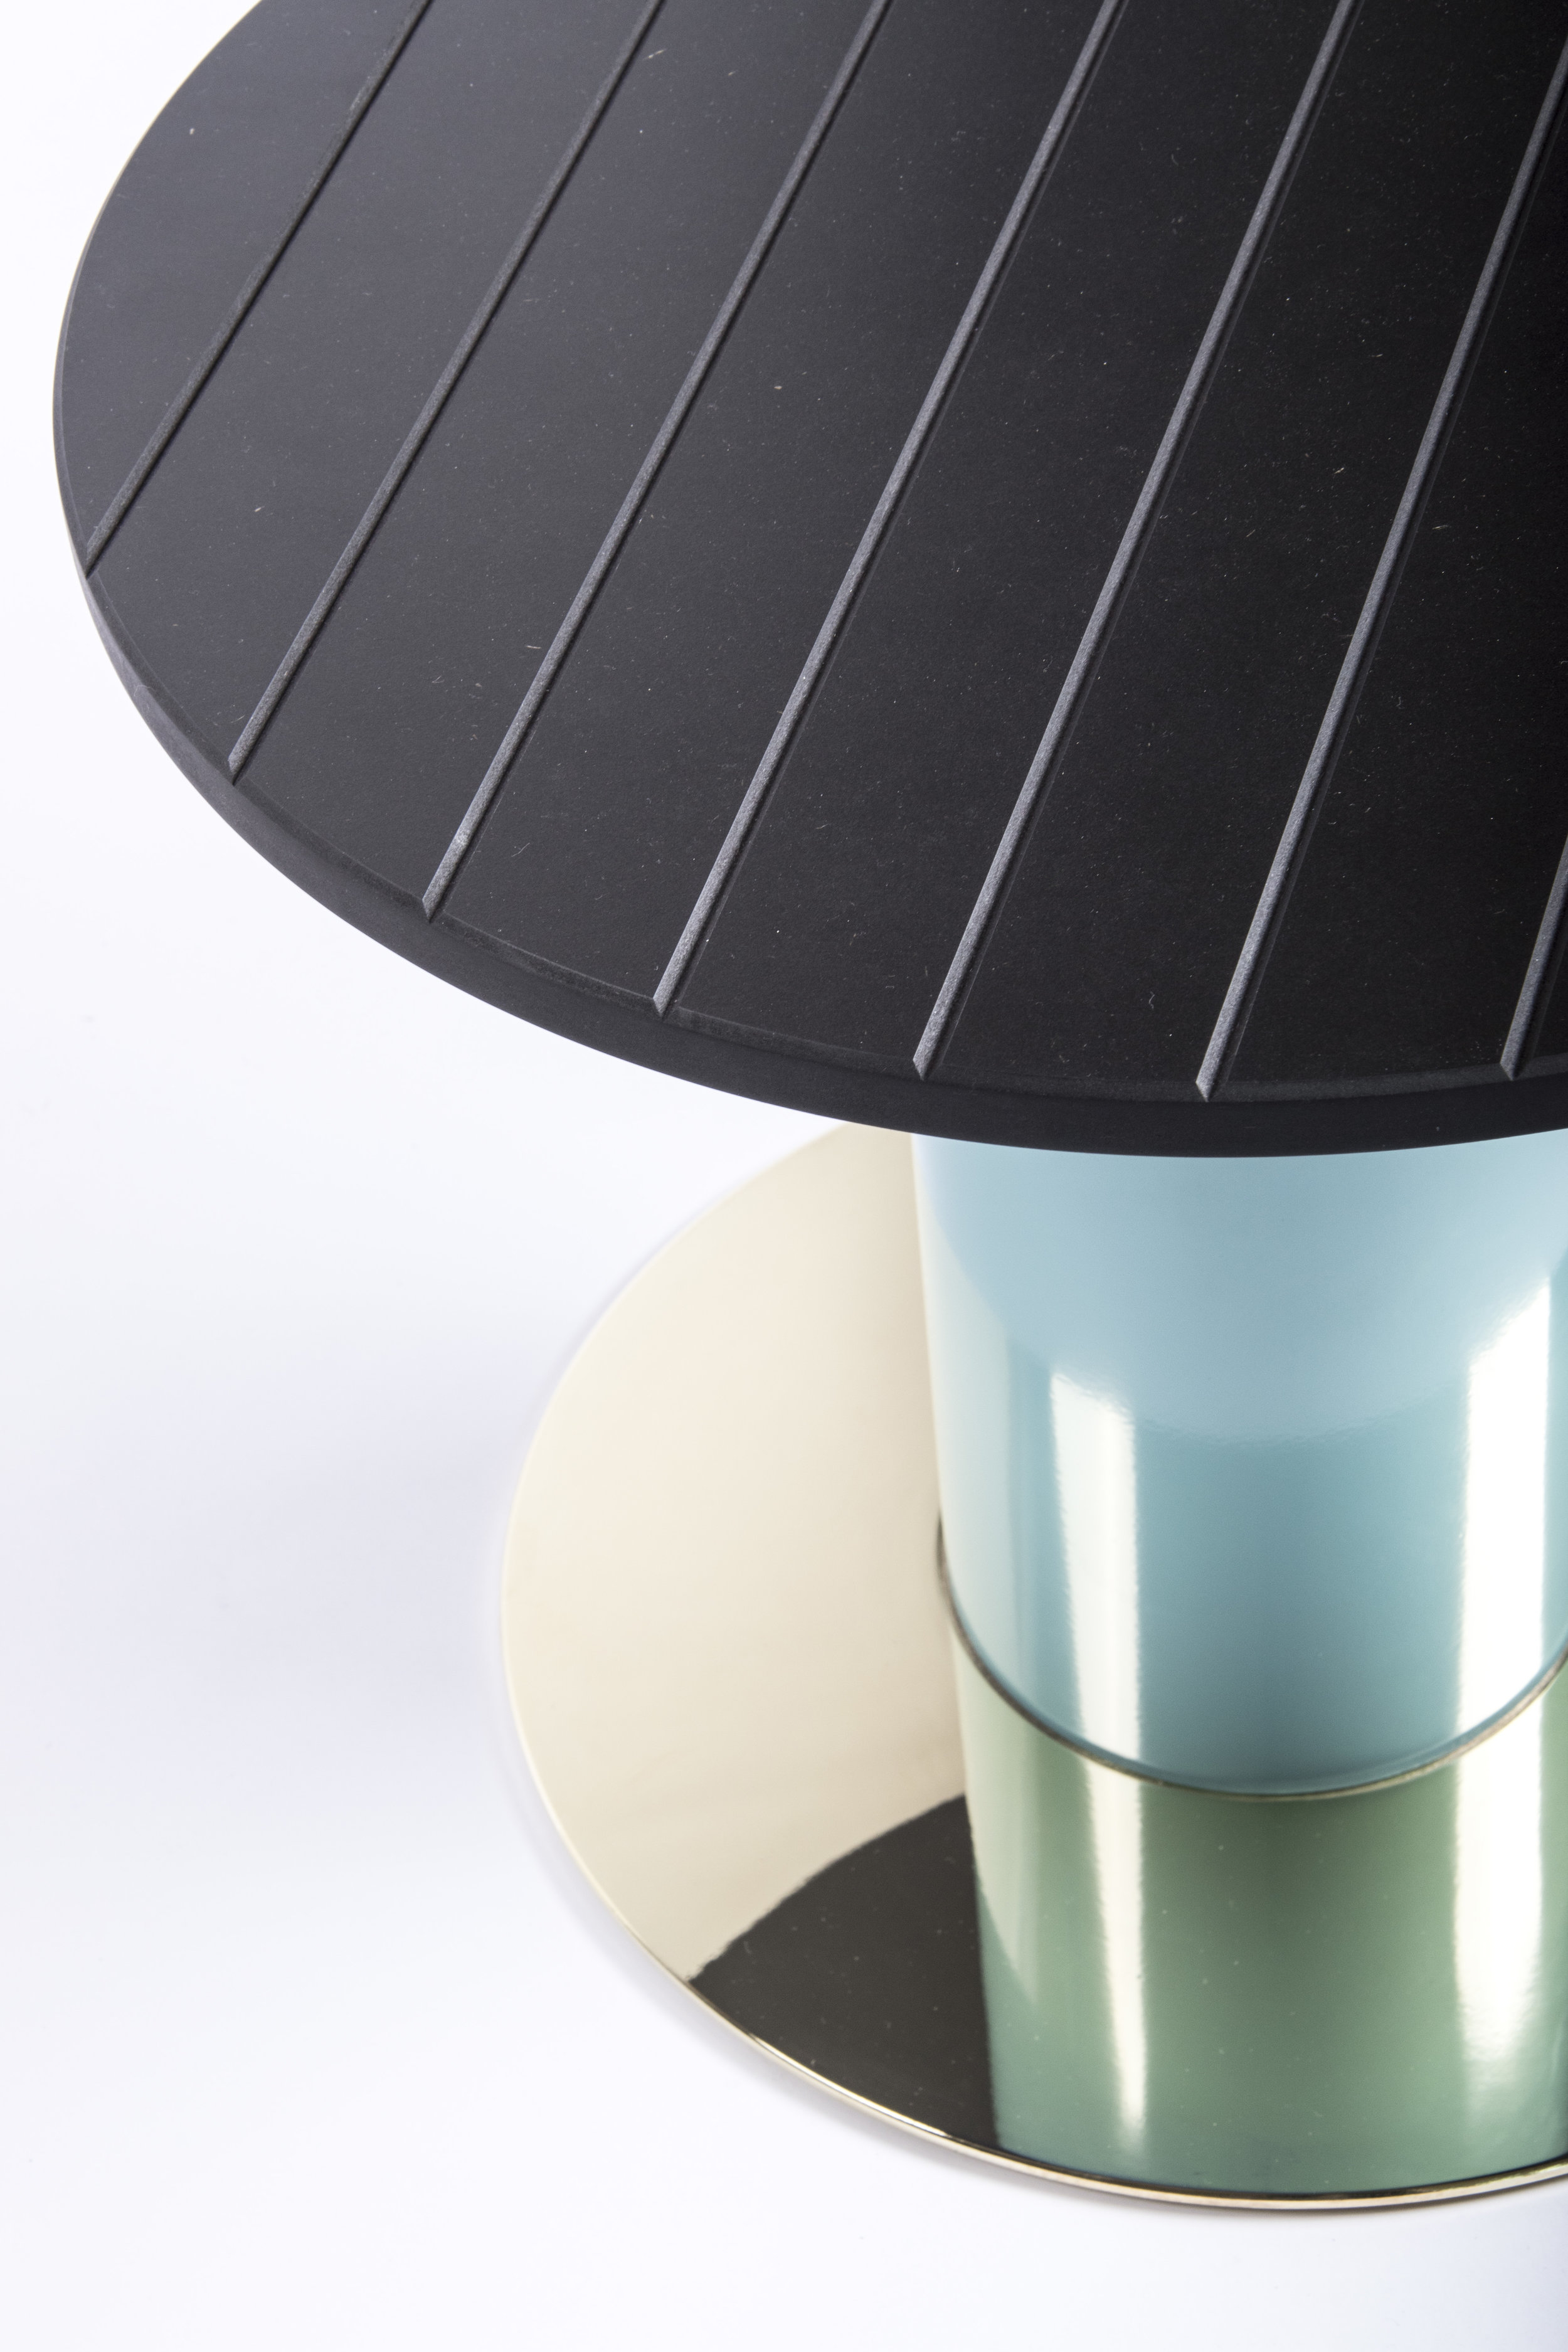 Reel Side Tables - David Derksen Design11.jpg